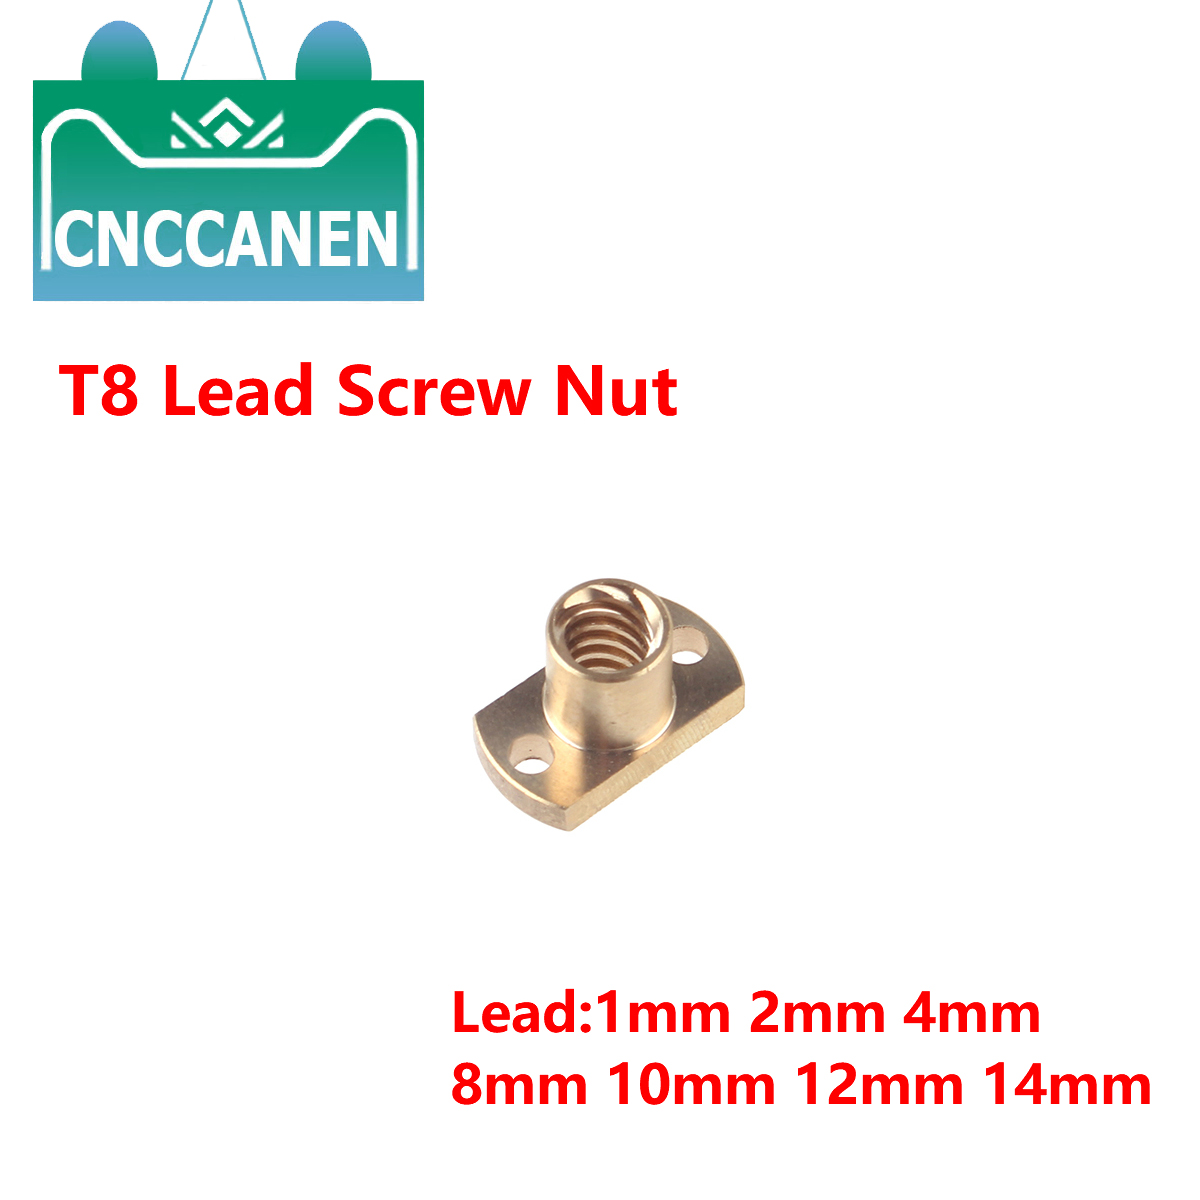 T8 Nut H Flange Copper Nut For T8 Lead Screw Pitch 2mm Lead 2mm 4mm 8mm 12mm For T8 Screw Trapezoidal Screw 3D Printer Parts